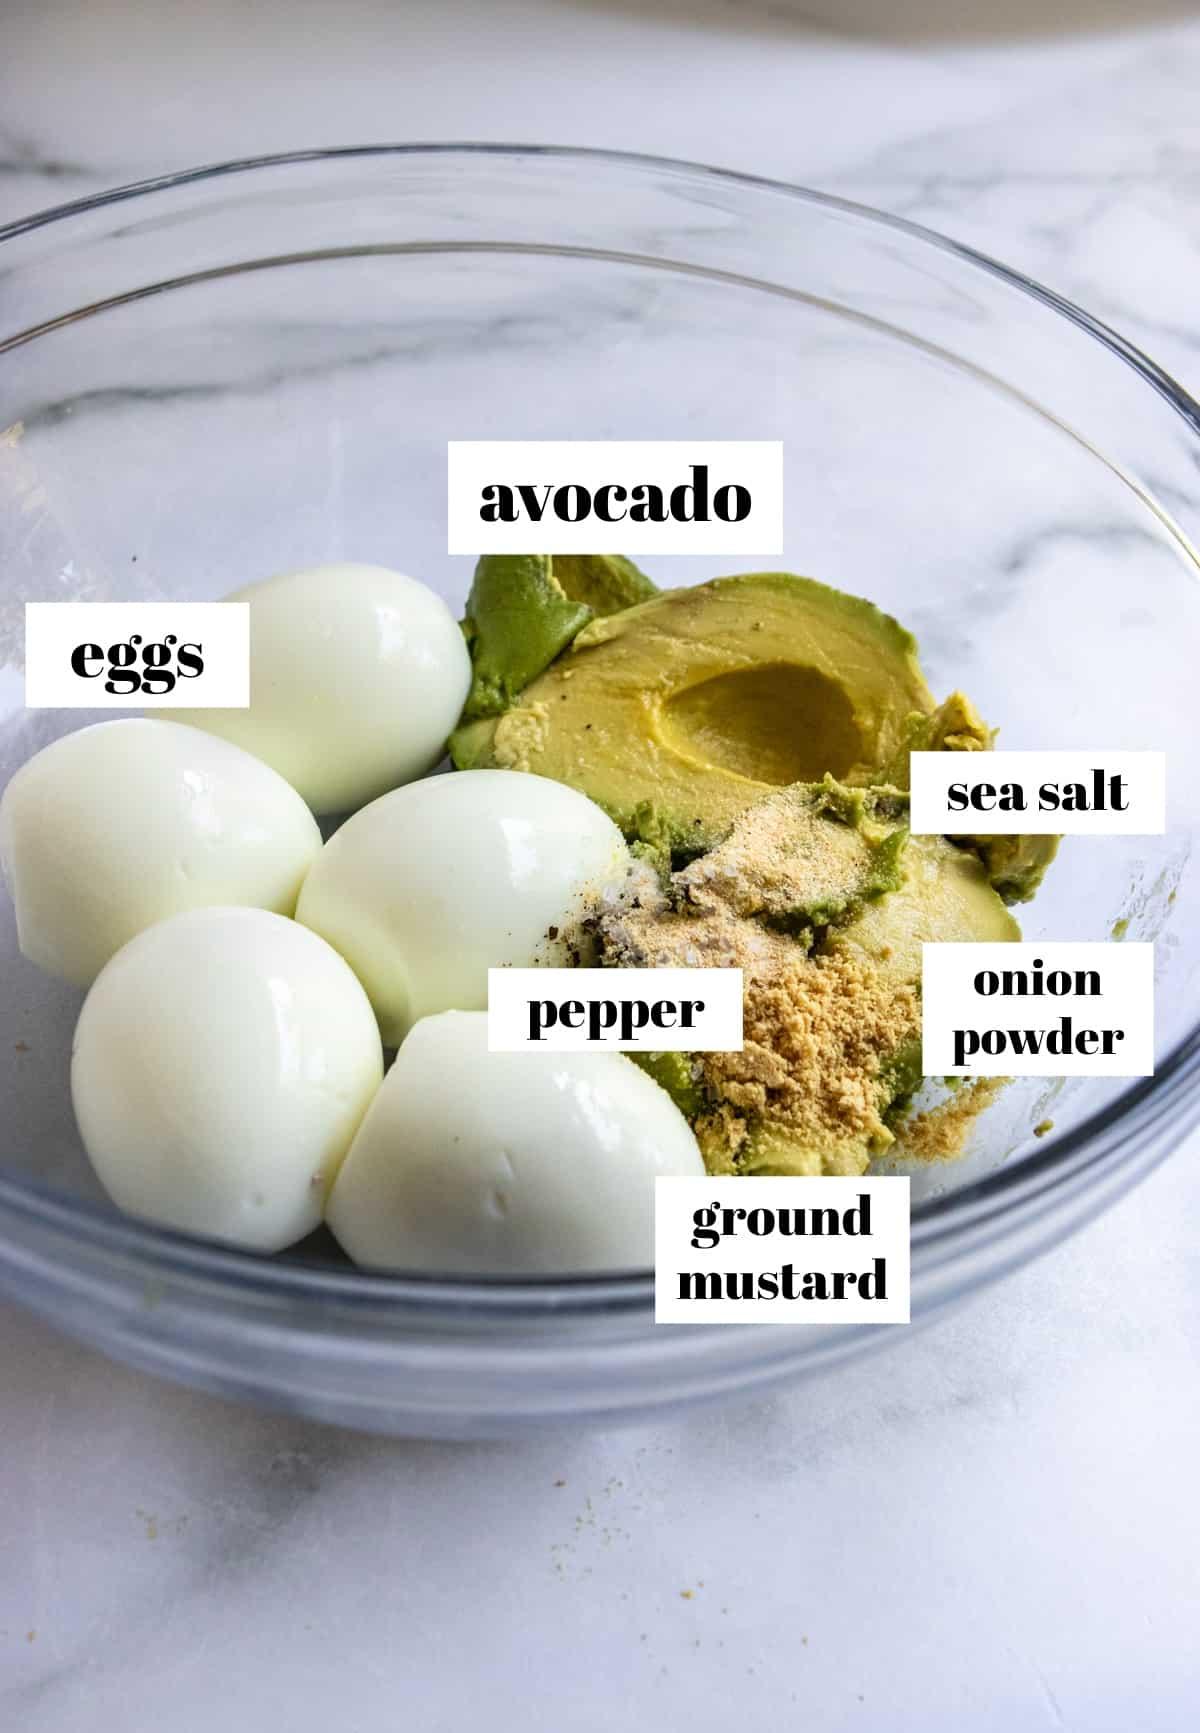 Eggs, avocado, seasonings in glass mixing bowl.